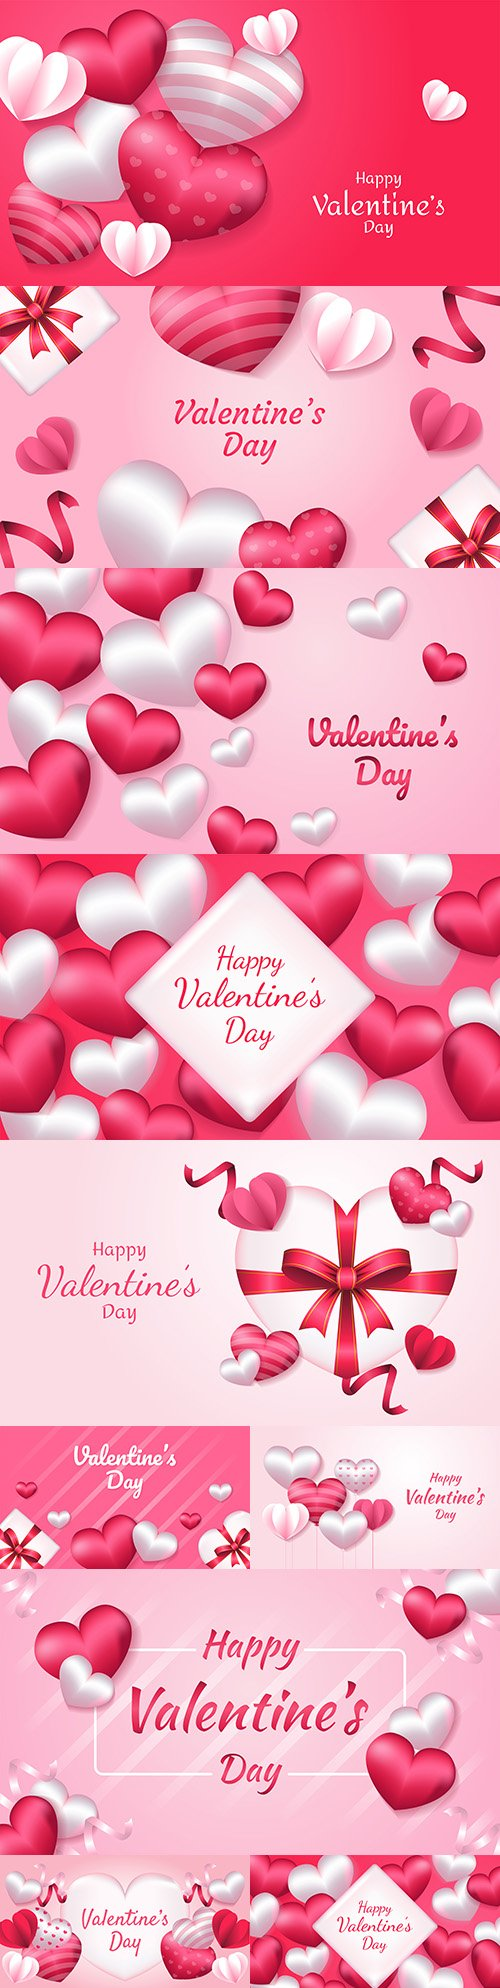 Happy Valentine's Day romantic decorative illustrations 39